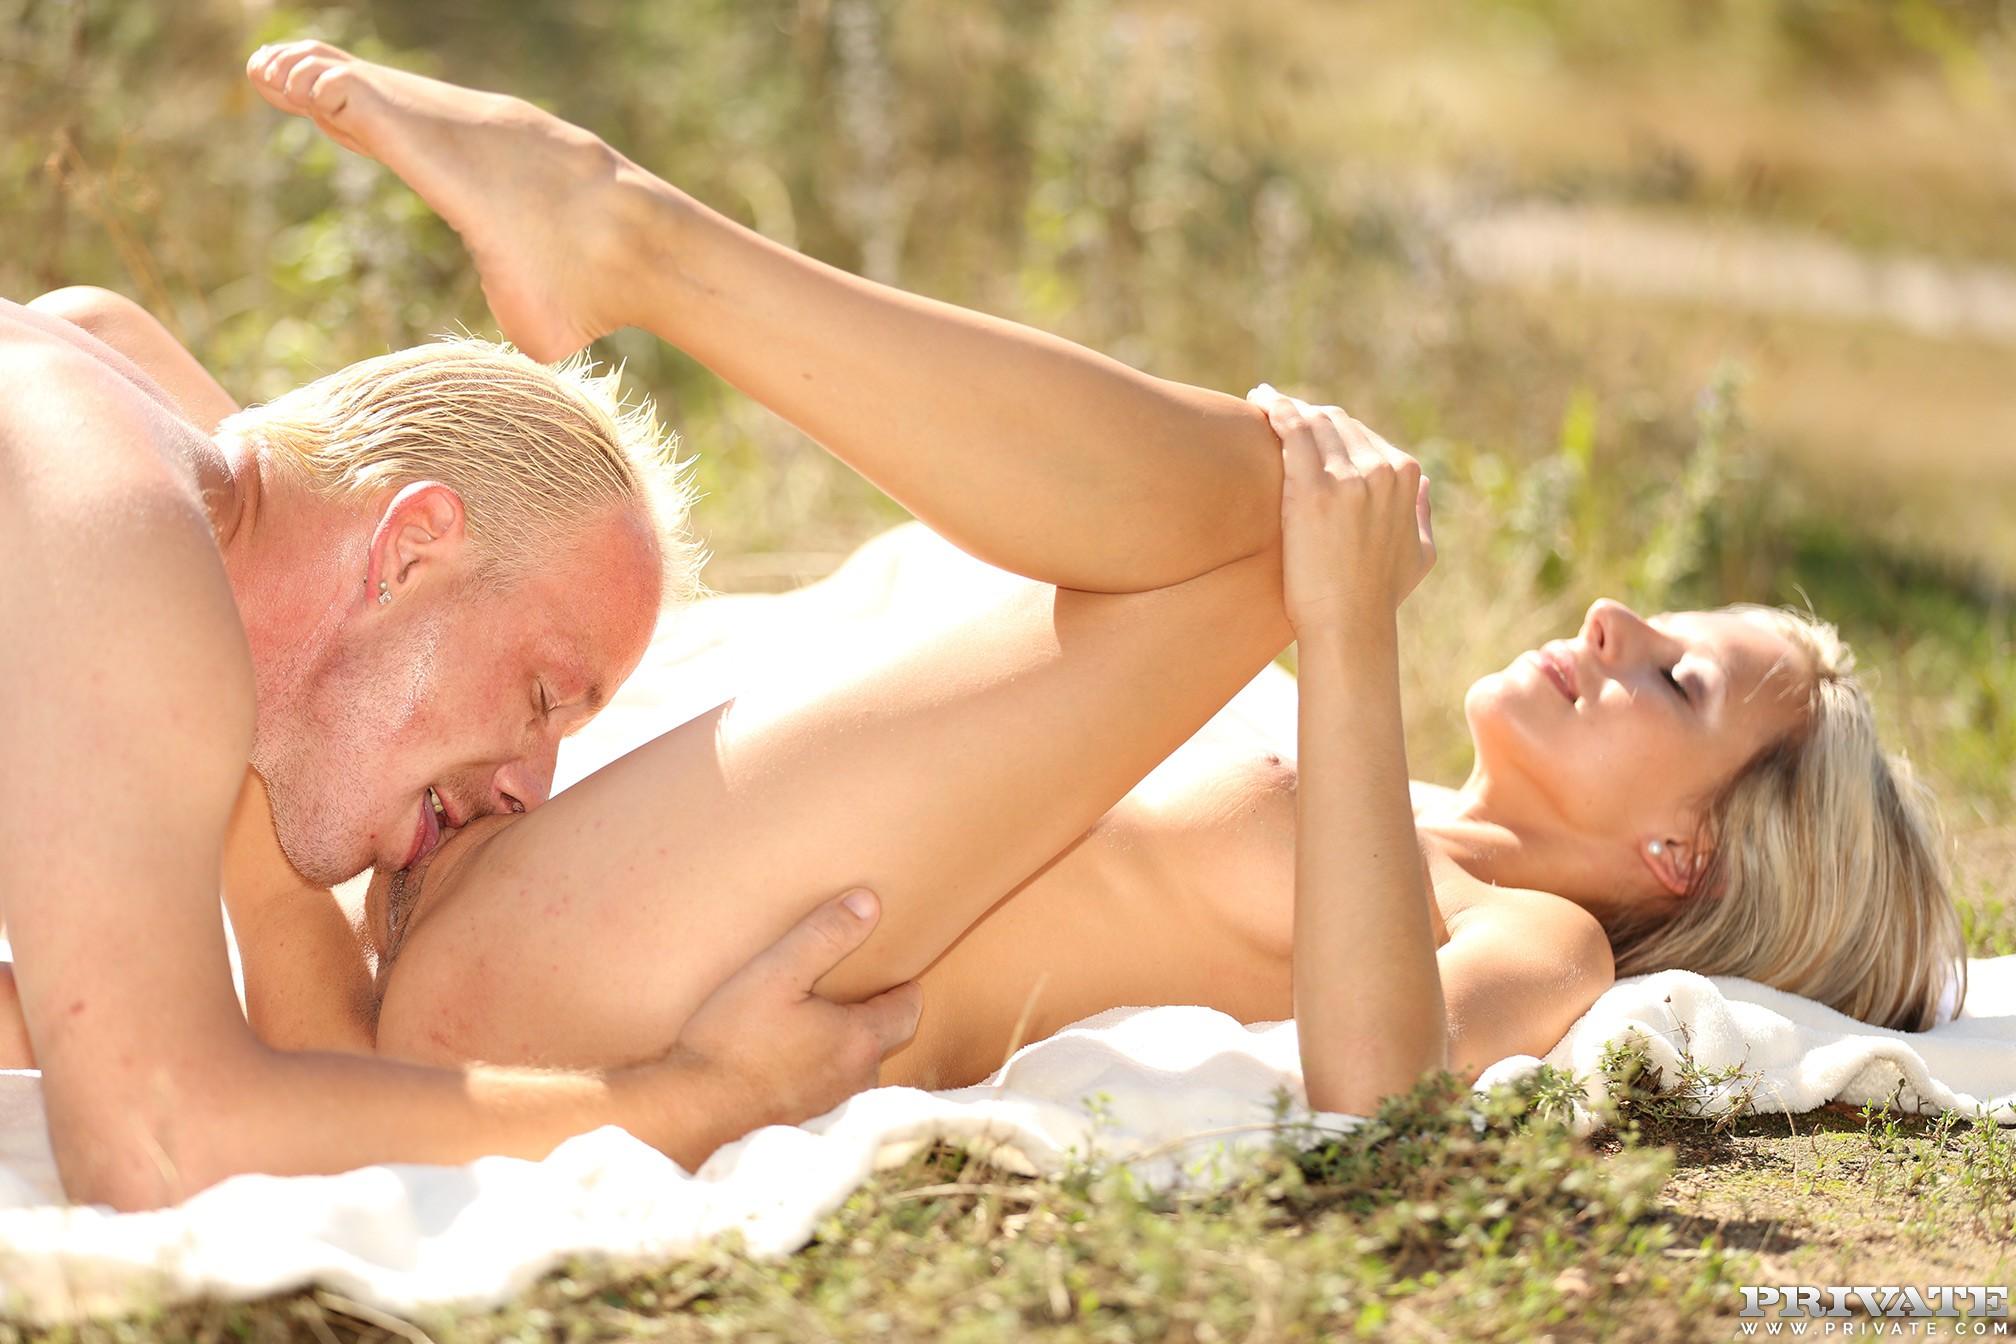 Sloppy blow job and tracy loves | Porno fotos)